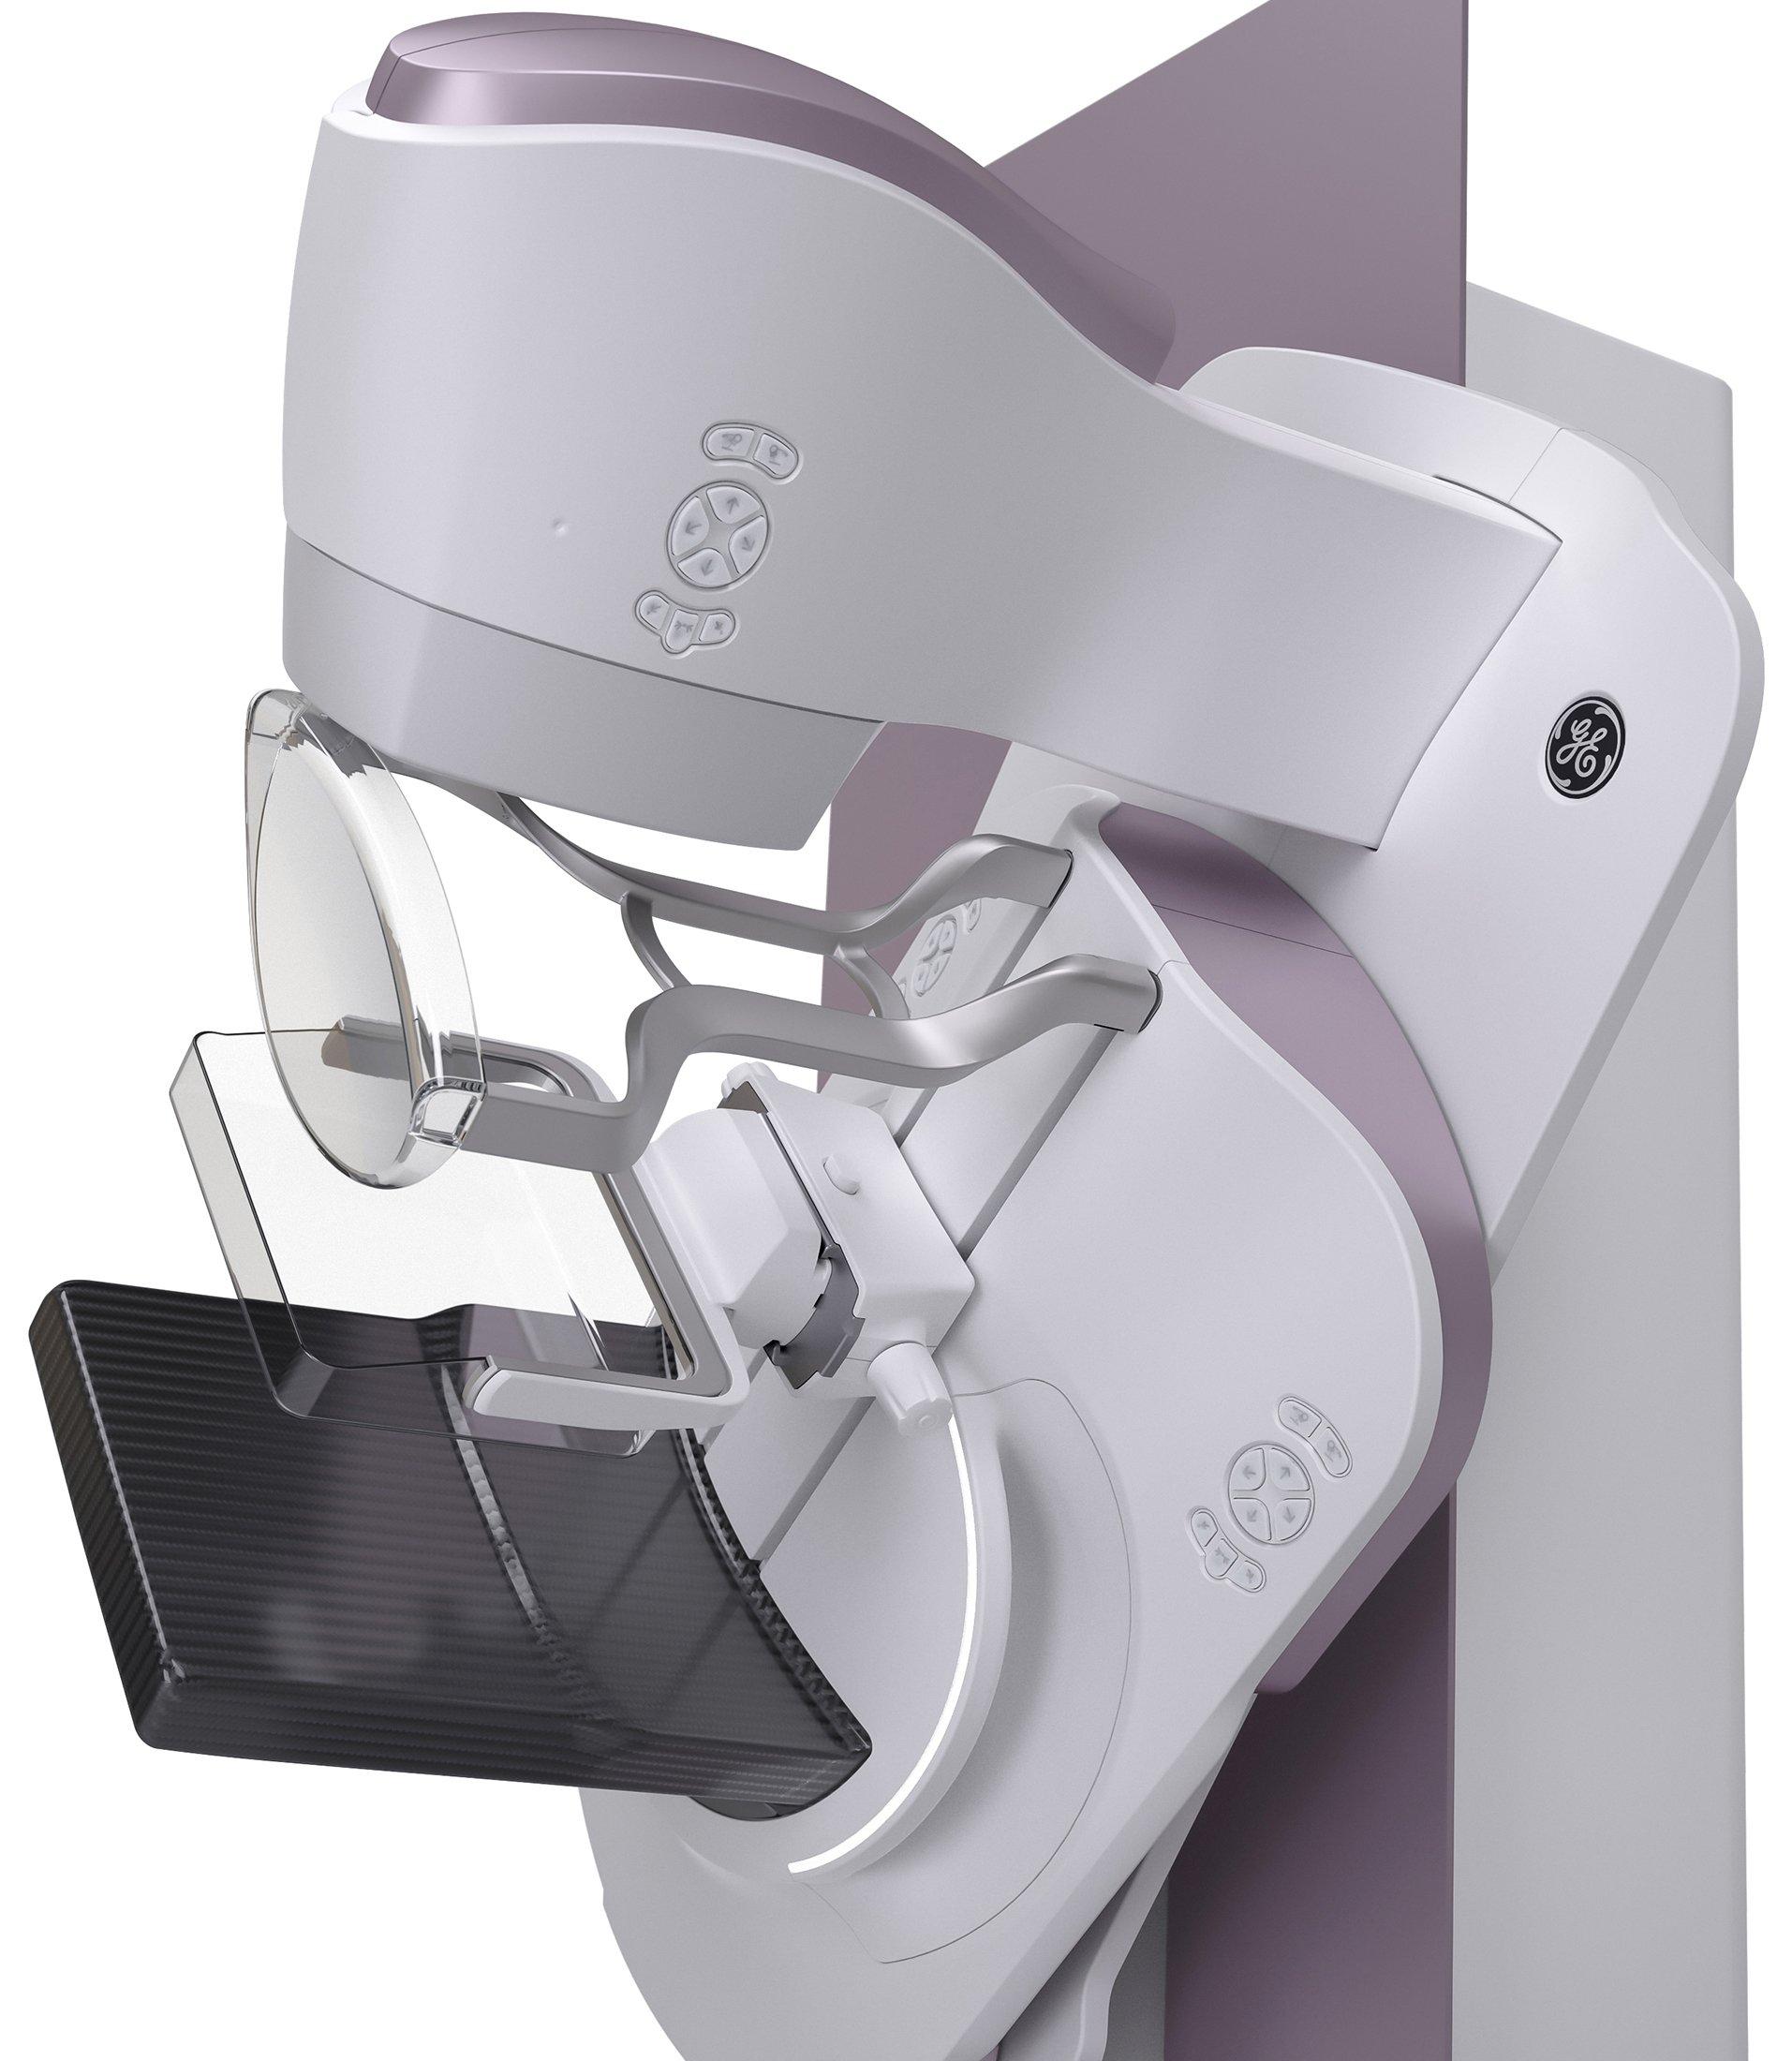 Ge Healthcare Launches Senographe Pristina Mammography